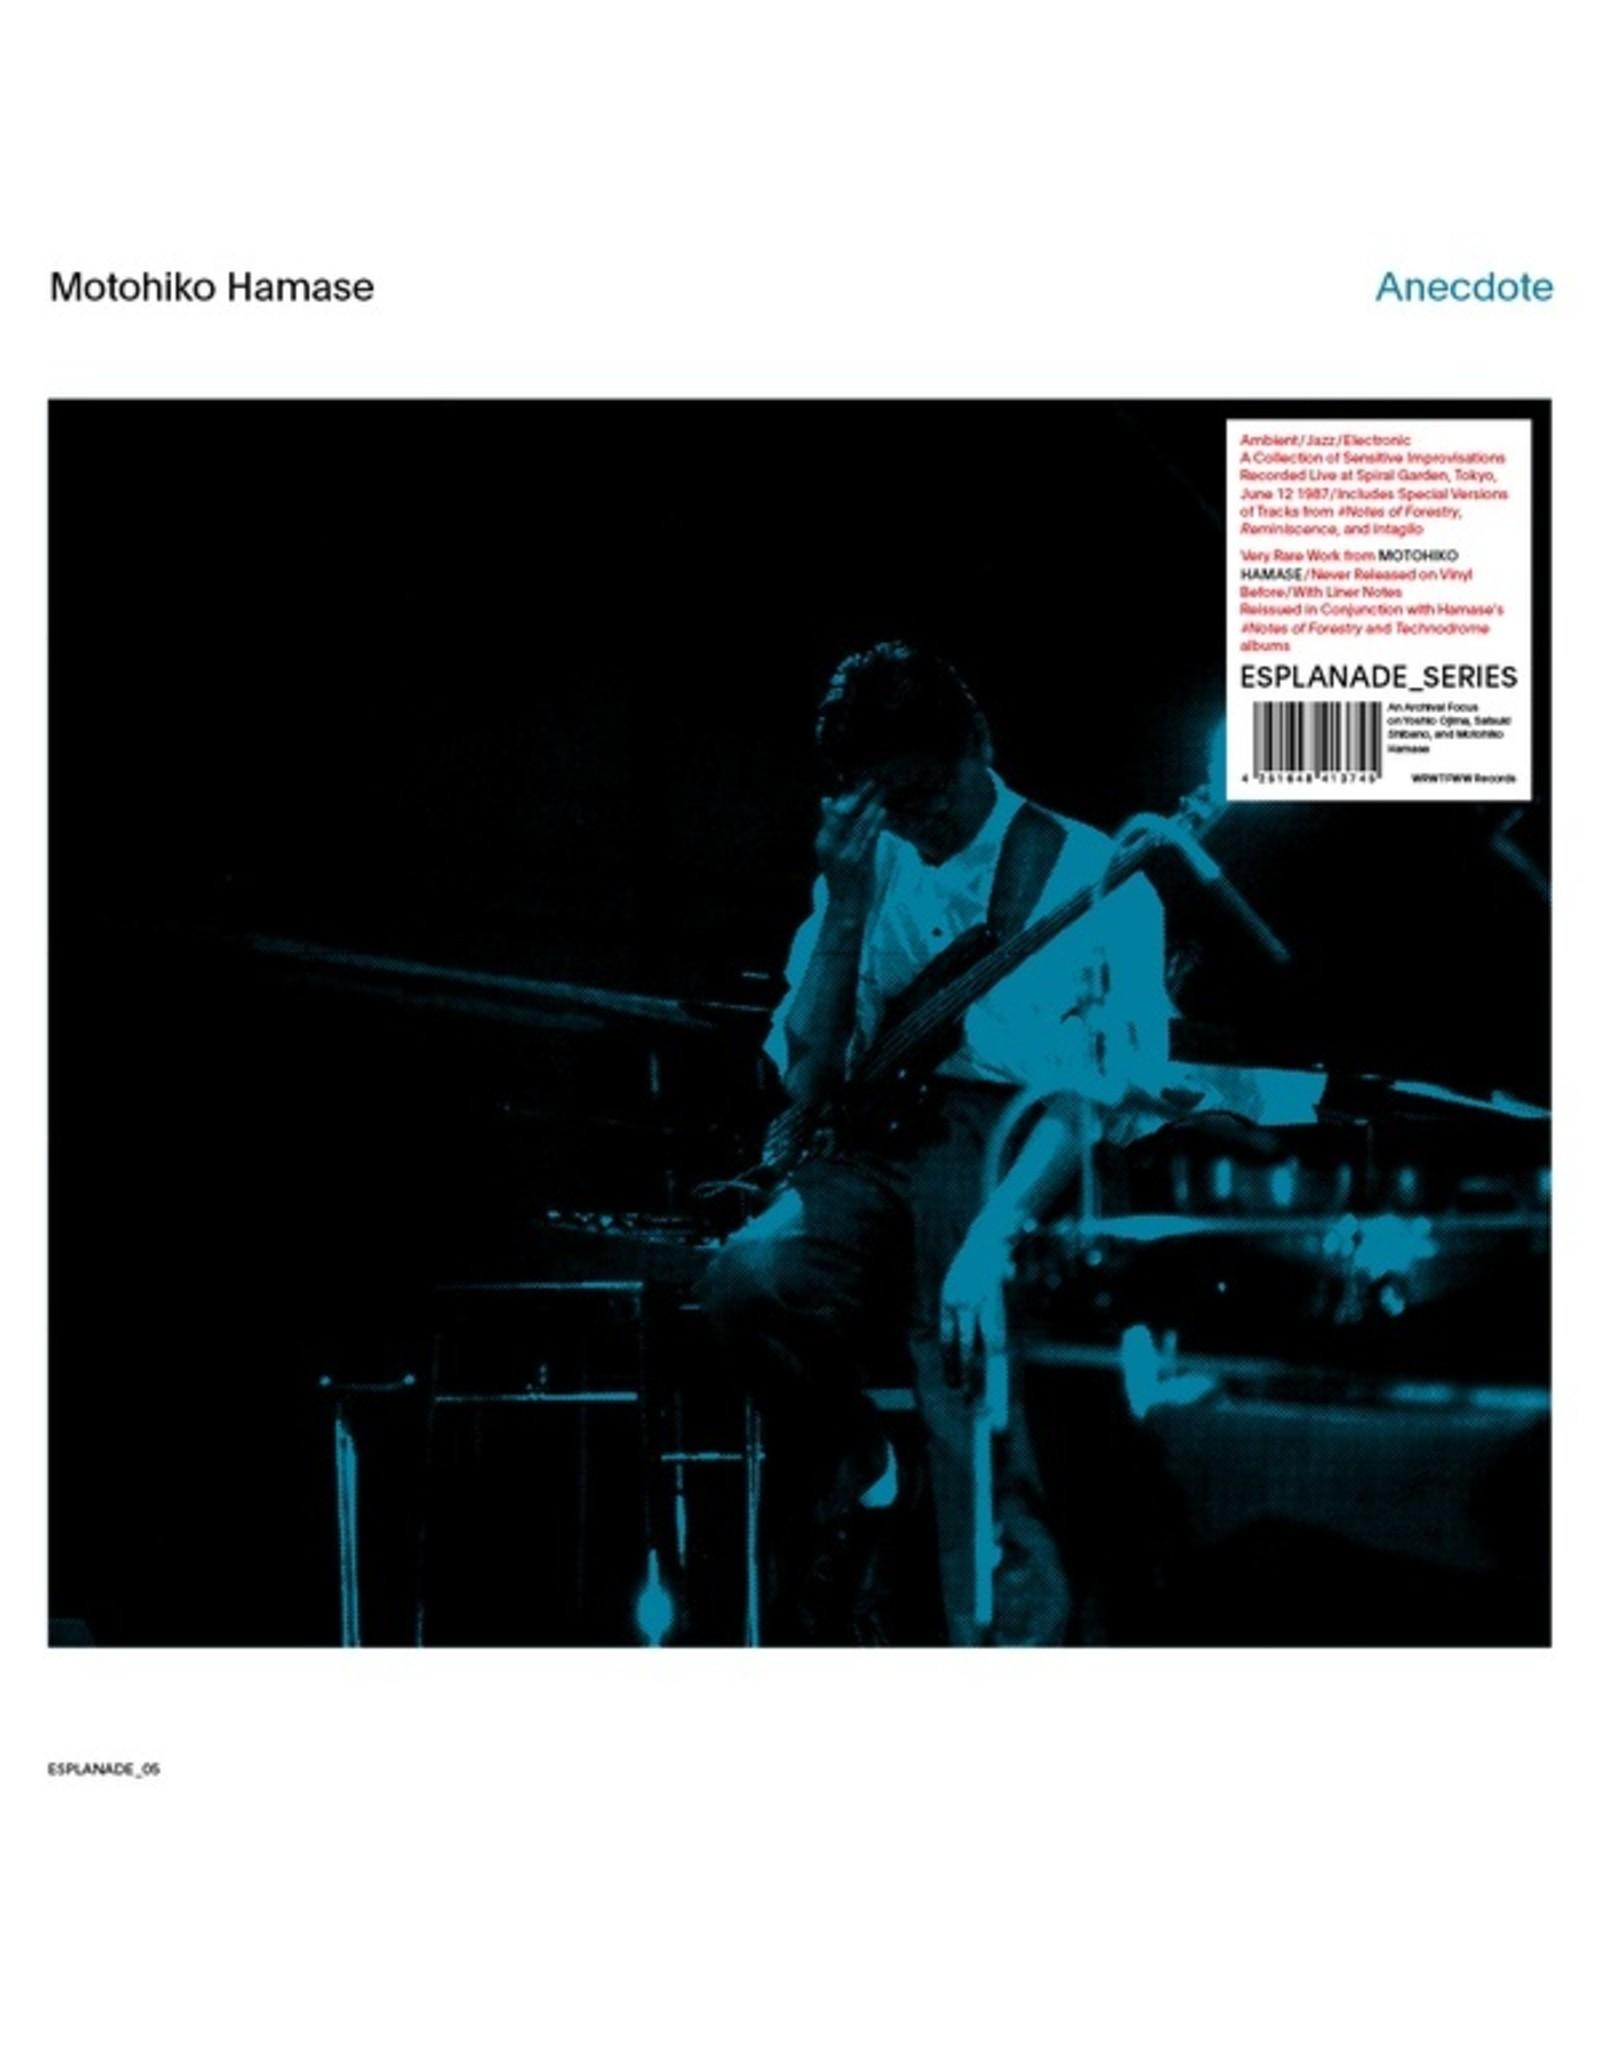 New Vinyl Motohiko Hamase - Anecdote 2LP